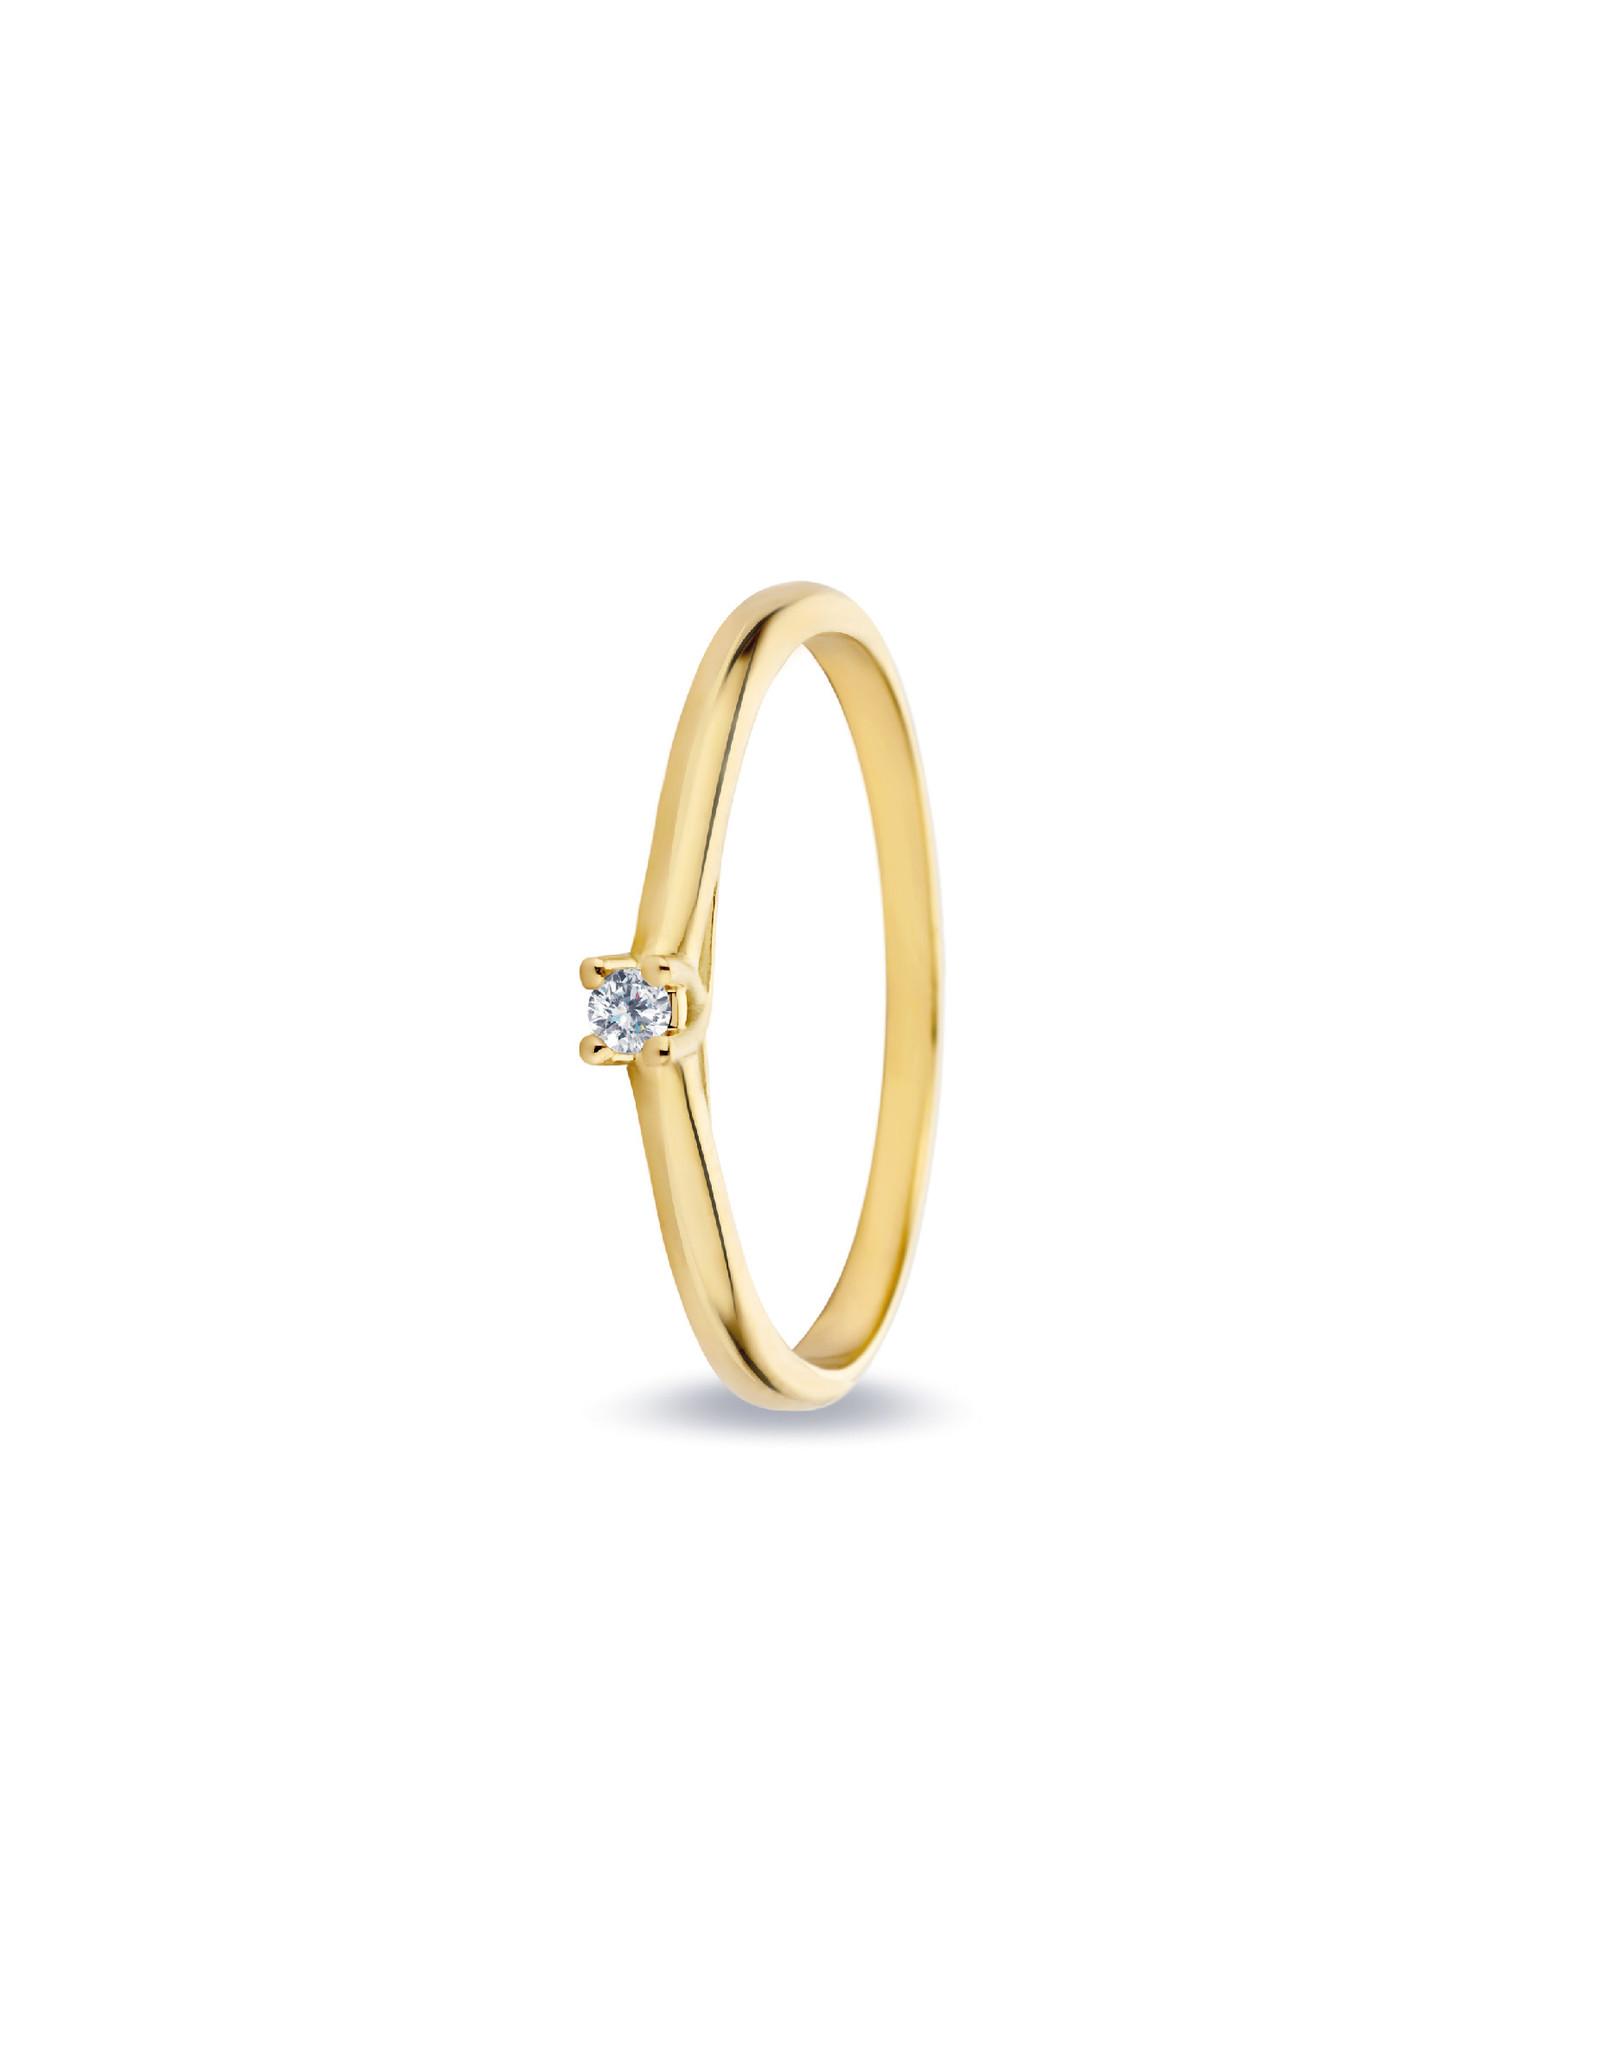 Miss Spring Ring Allerliefste Noor Geel Goud 18kt MSR529GG